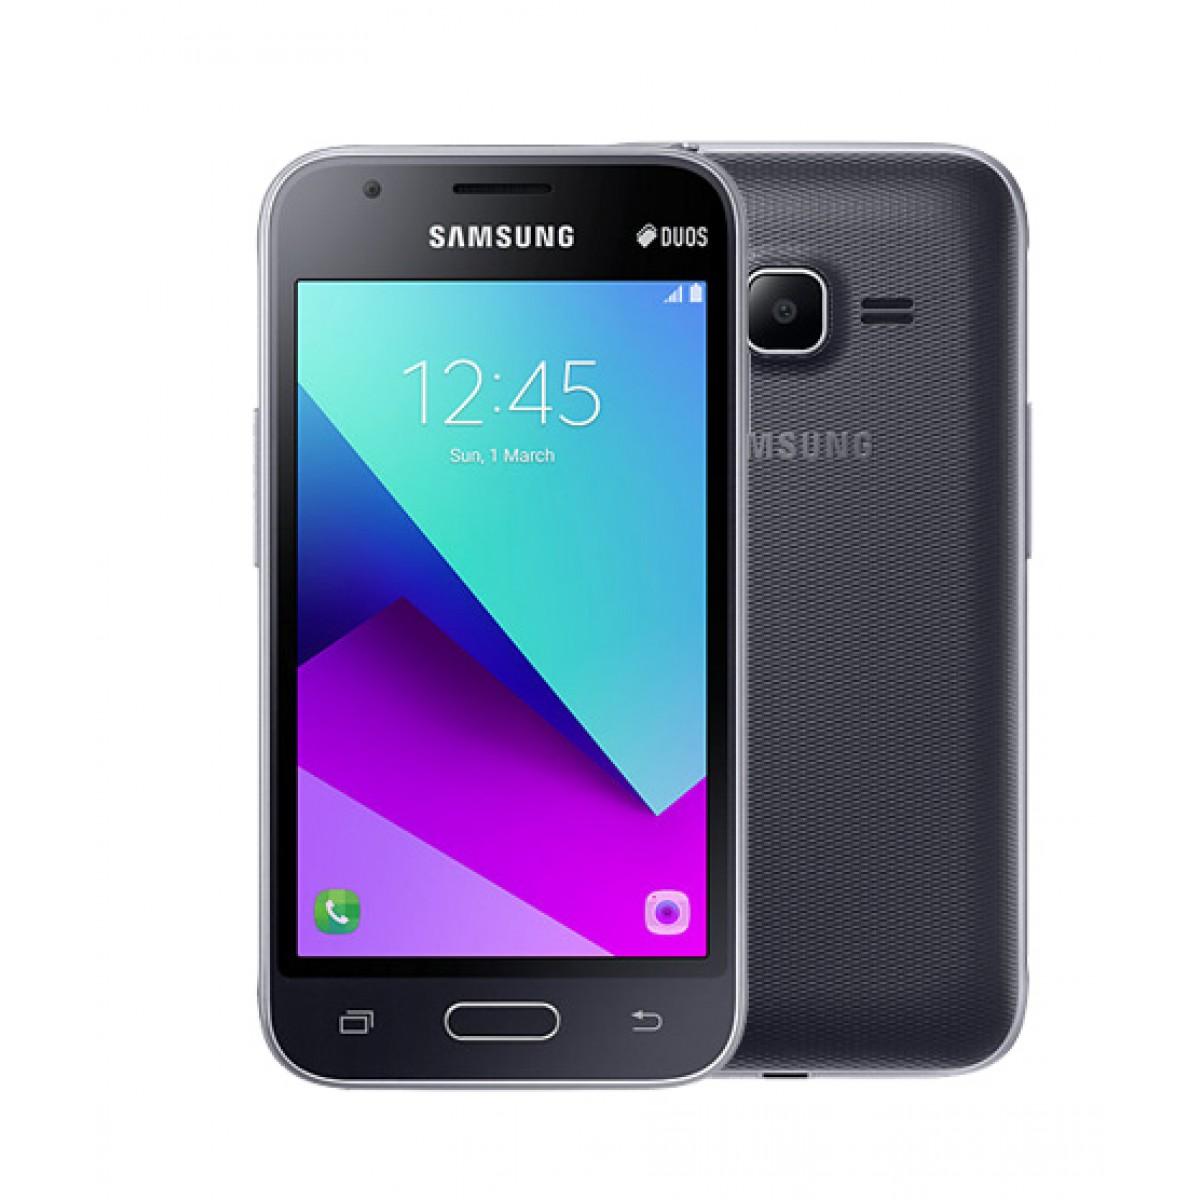 cabd9a8061c Samsung Galaxy J1 Mini Prime 2016 4G Price in Pakistan